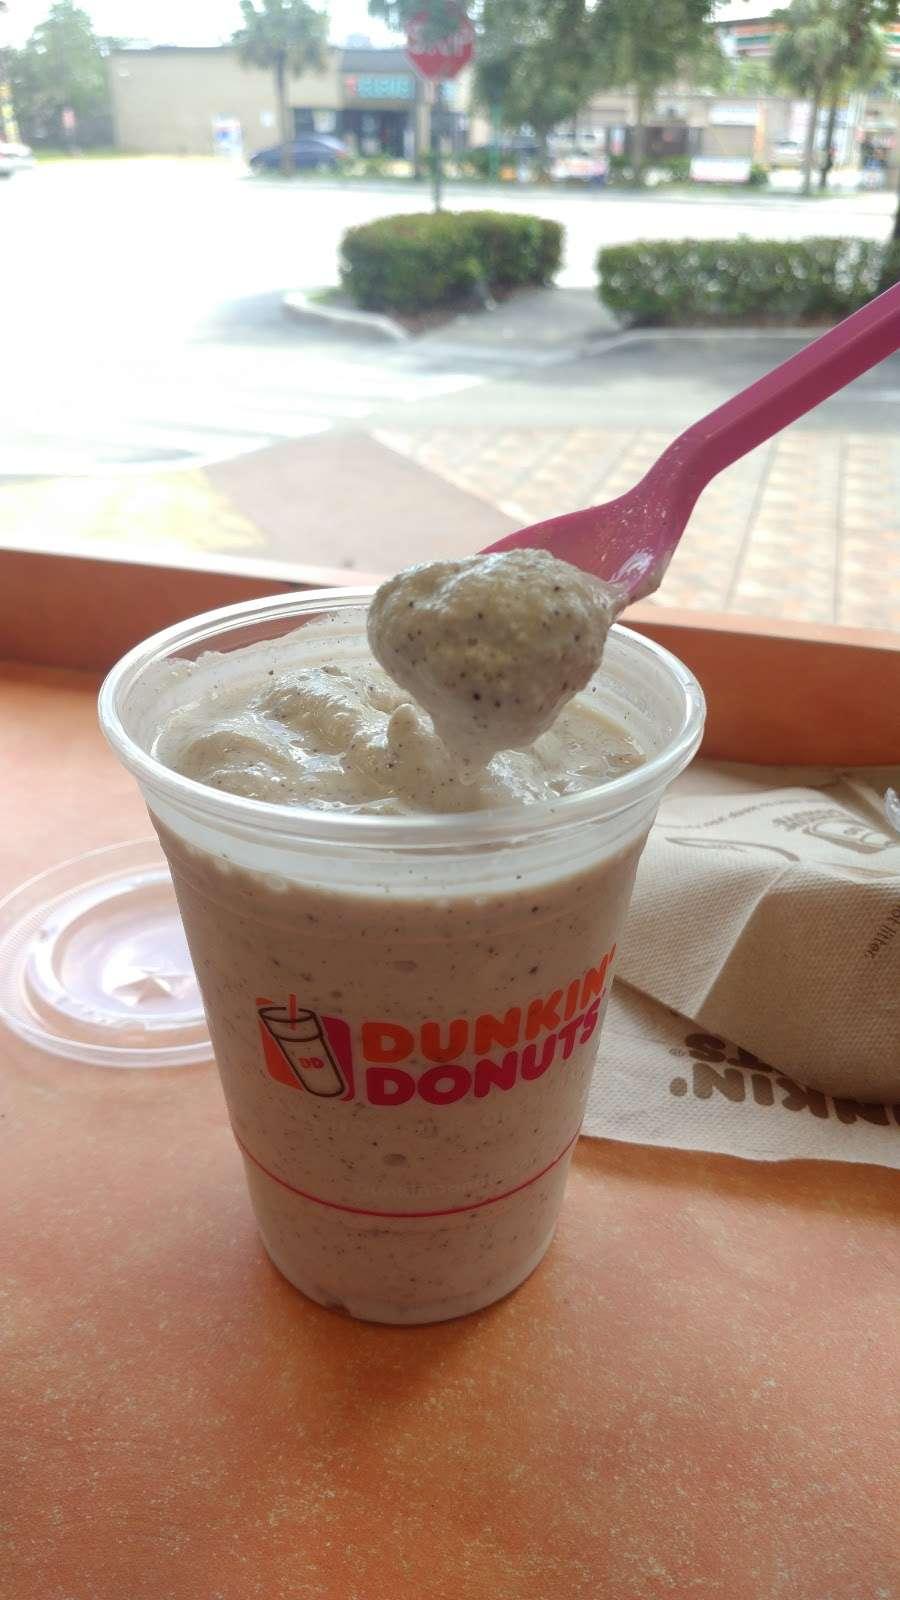 Dunkin - bakery  | Photo 4 of 10 | Address: 95 NW 167th St, North Miami Beach, FL 33169, USA | Phone: (305) 655-0101